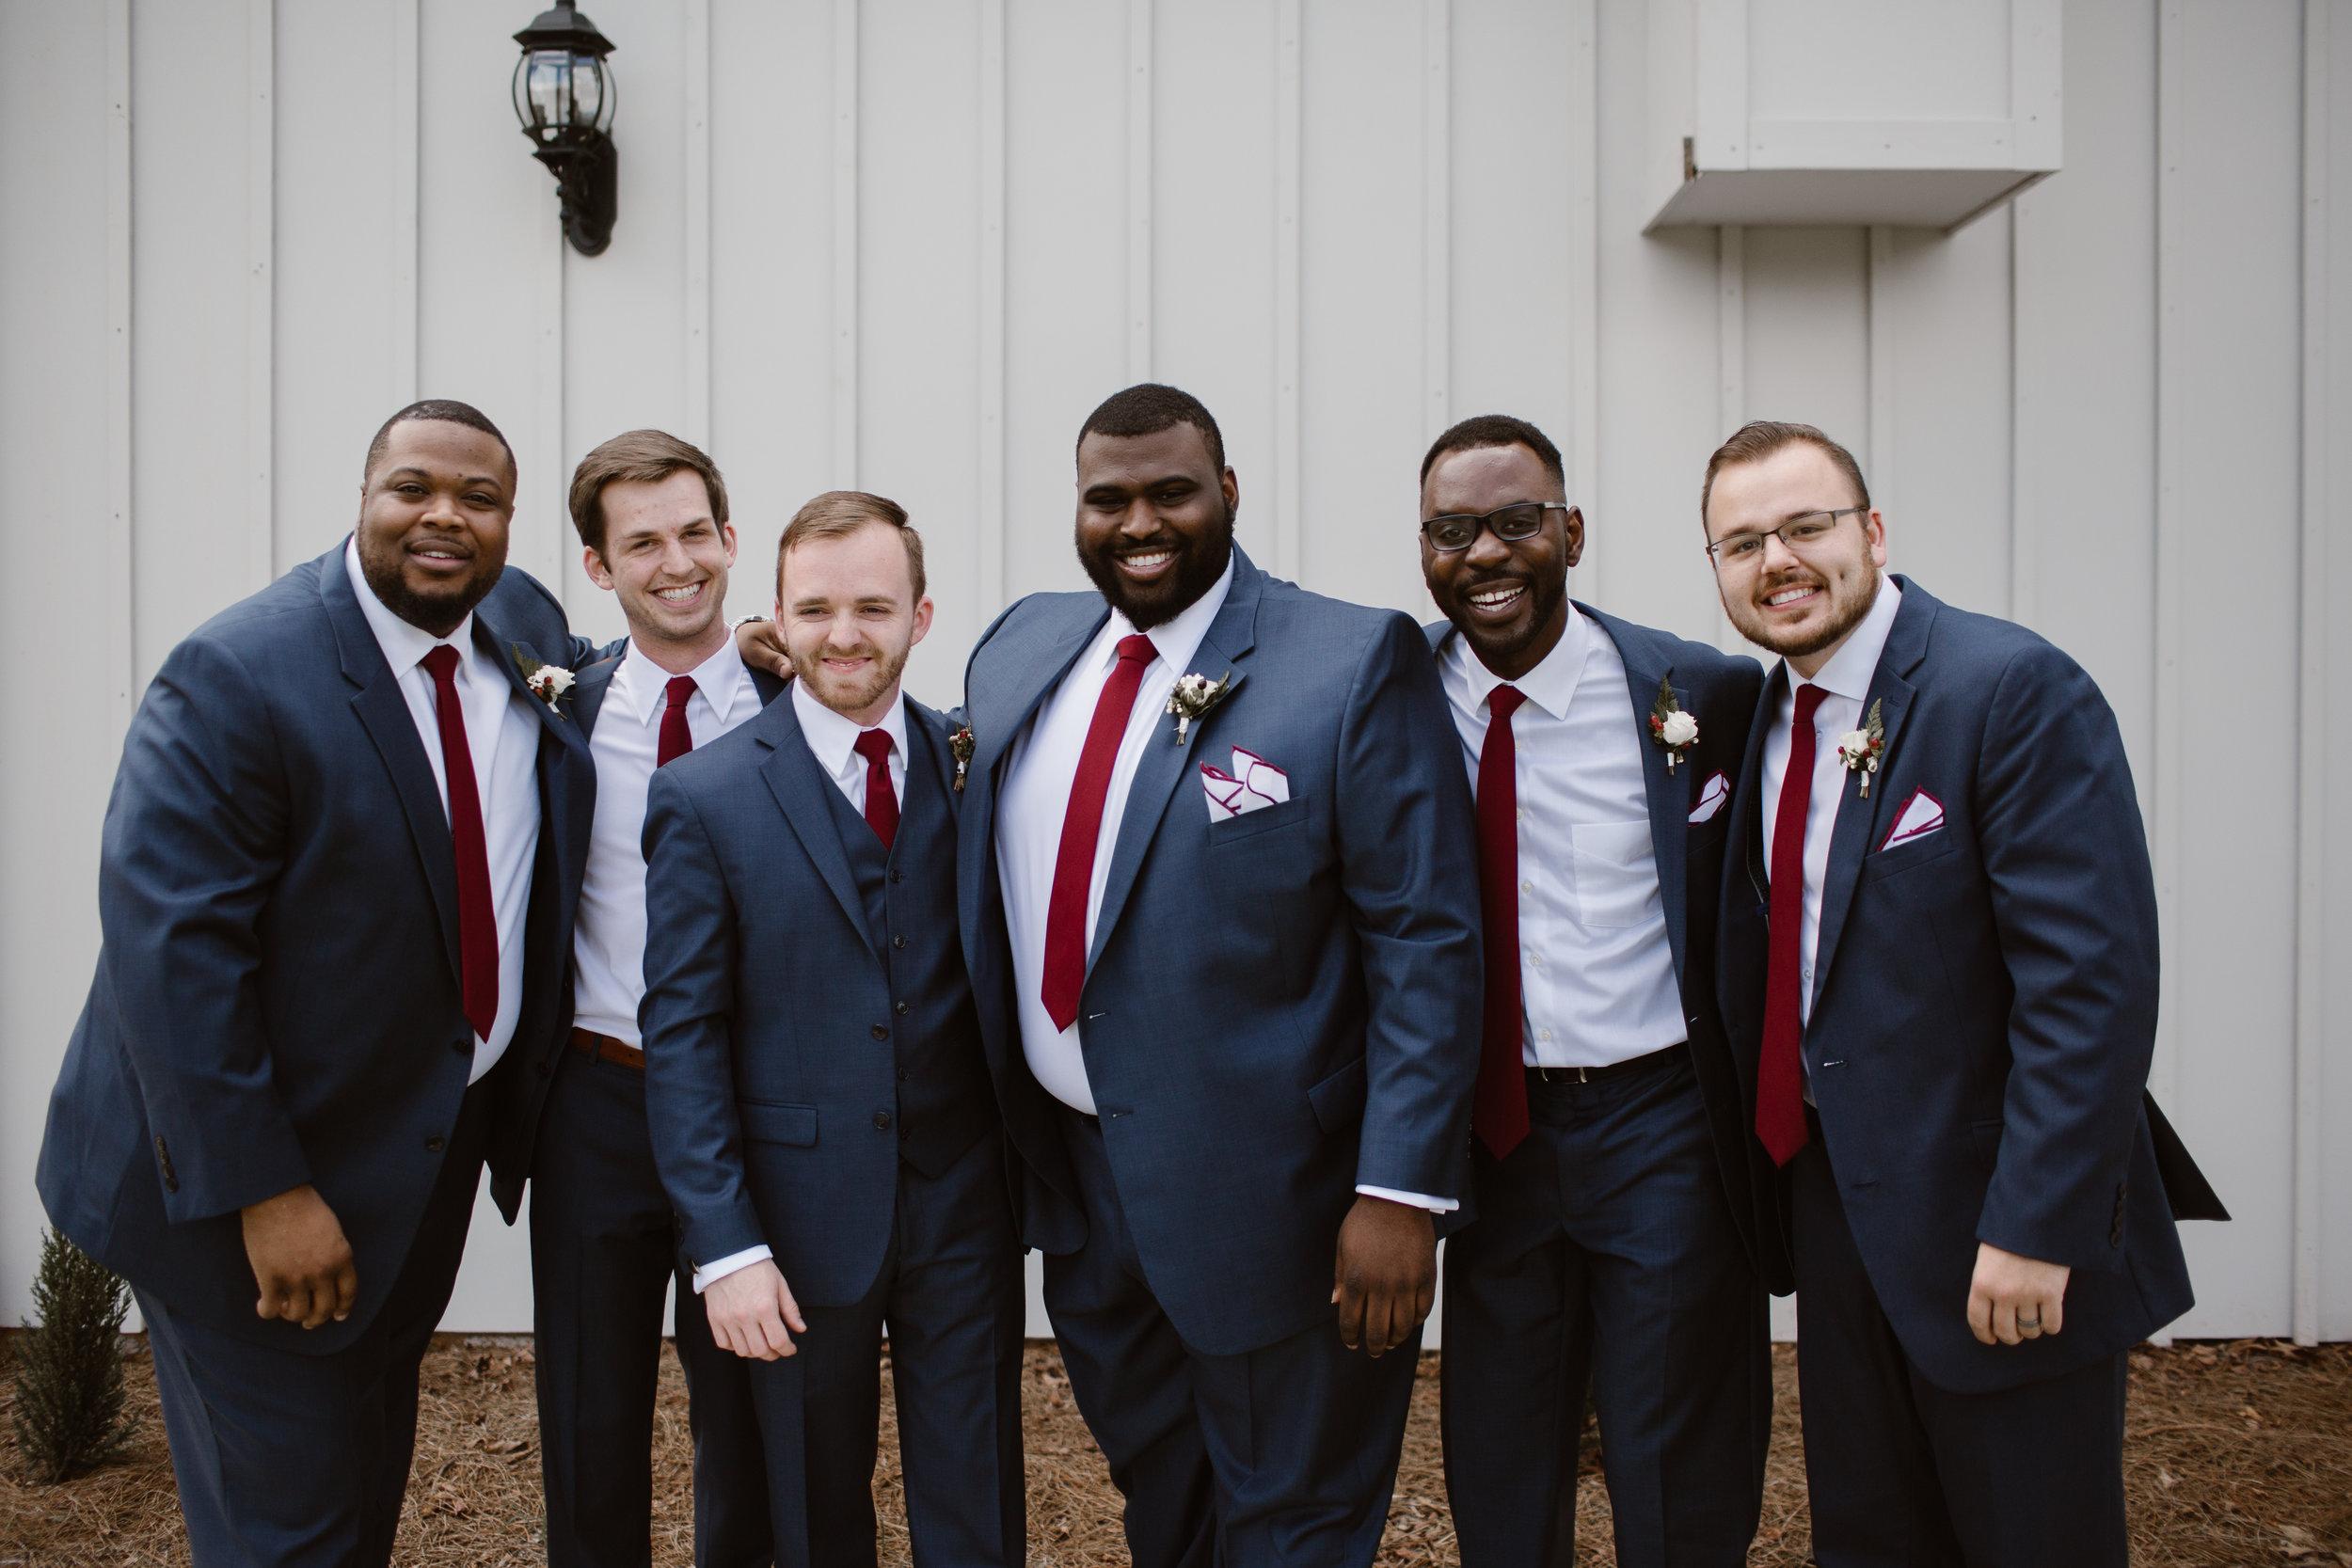 Maroon Groomsmen Ties - A Burgundy + Bronze Ramble Creek Fall Wedding - Erin Morrison Photography